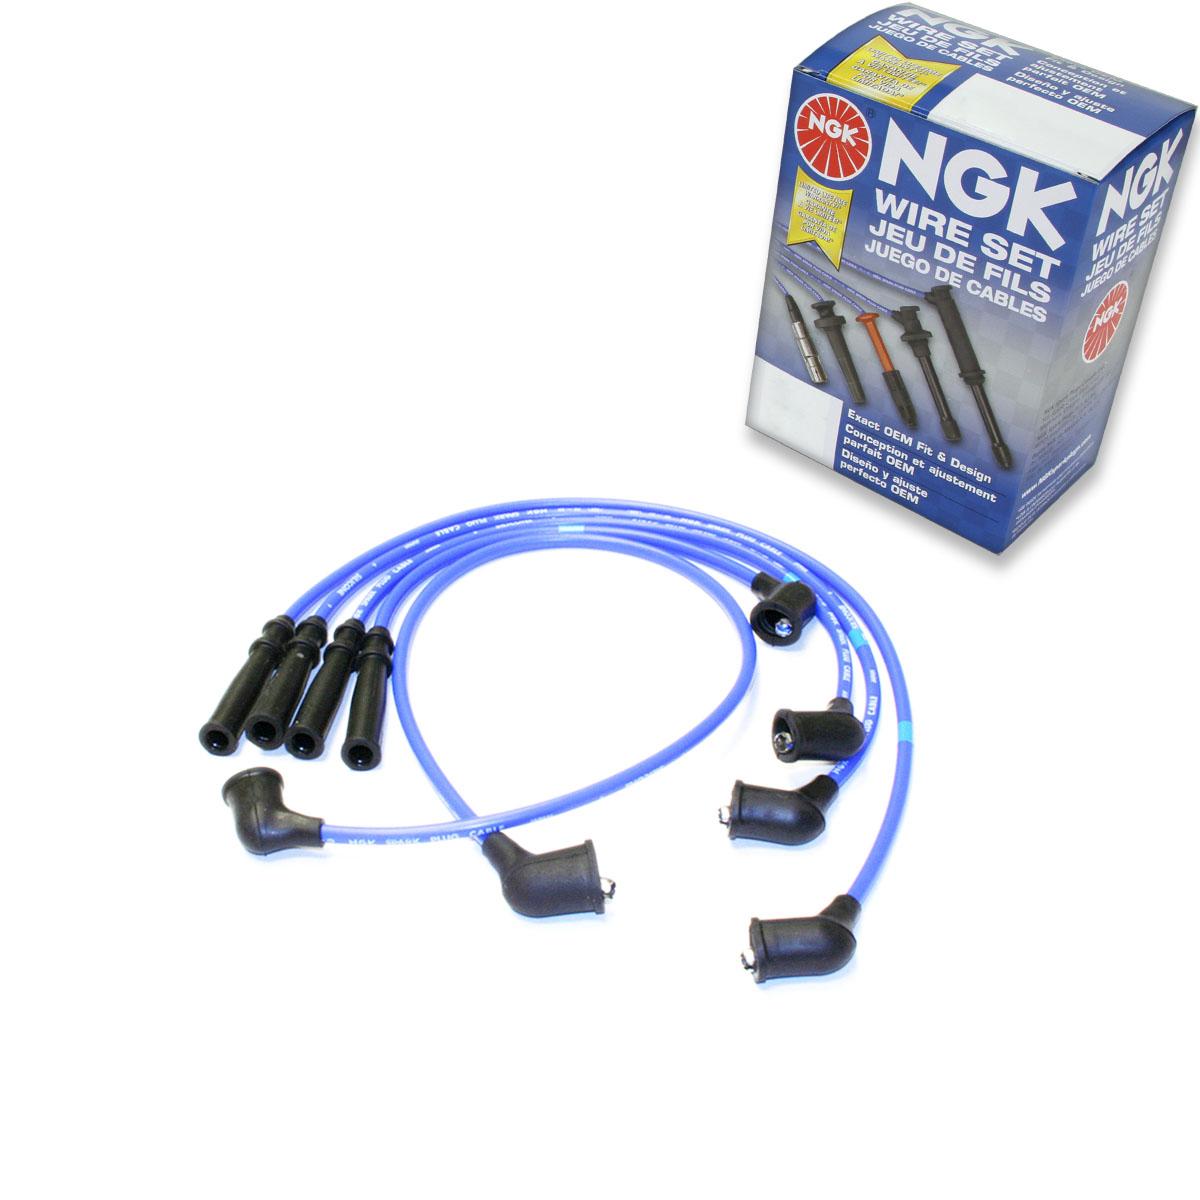 Details about 1 pc NGK Spark Plug Wire Set for 1990-1994 Nissan D21 2 4L L4  - Engine Kit xx